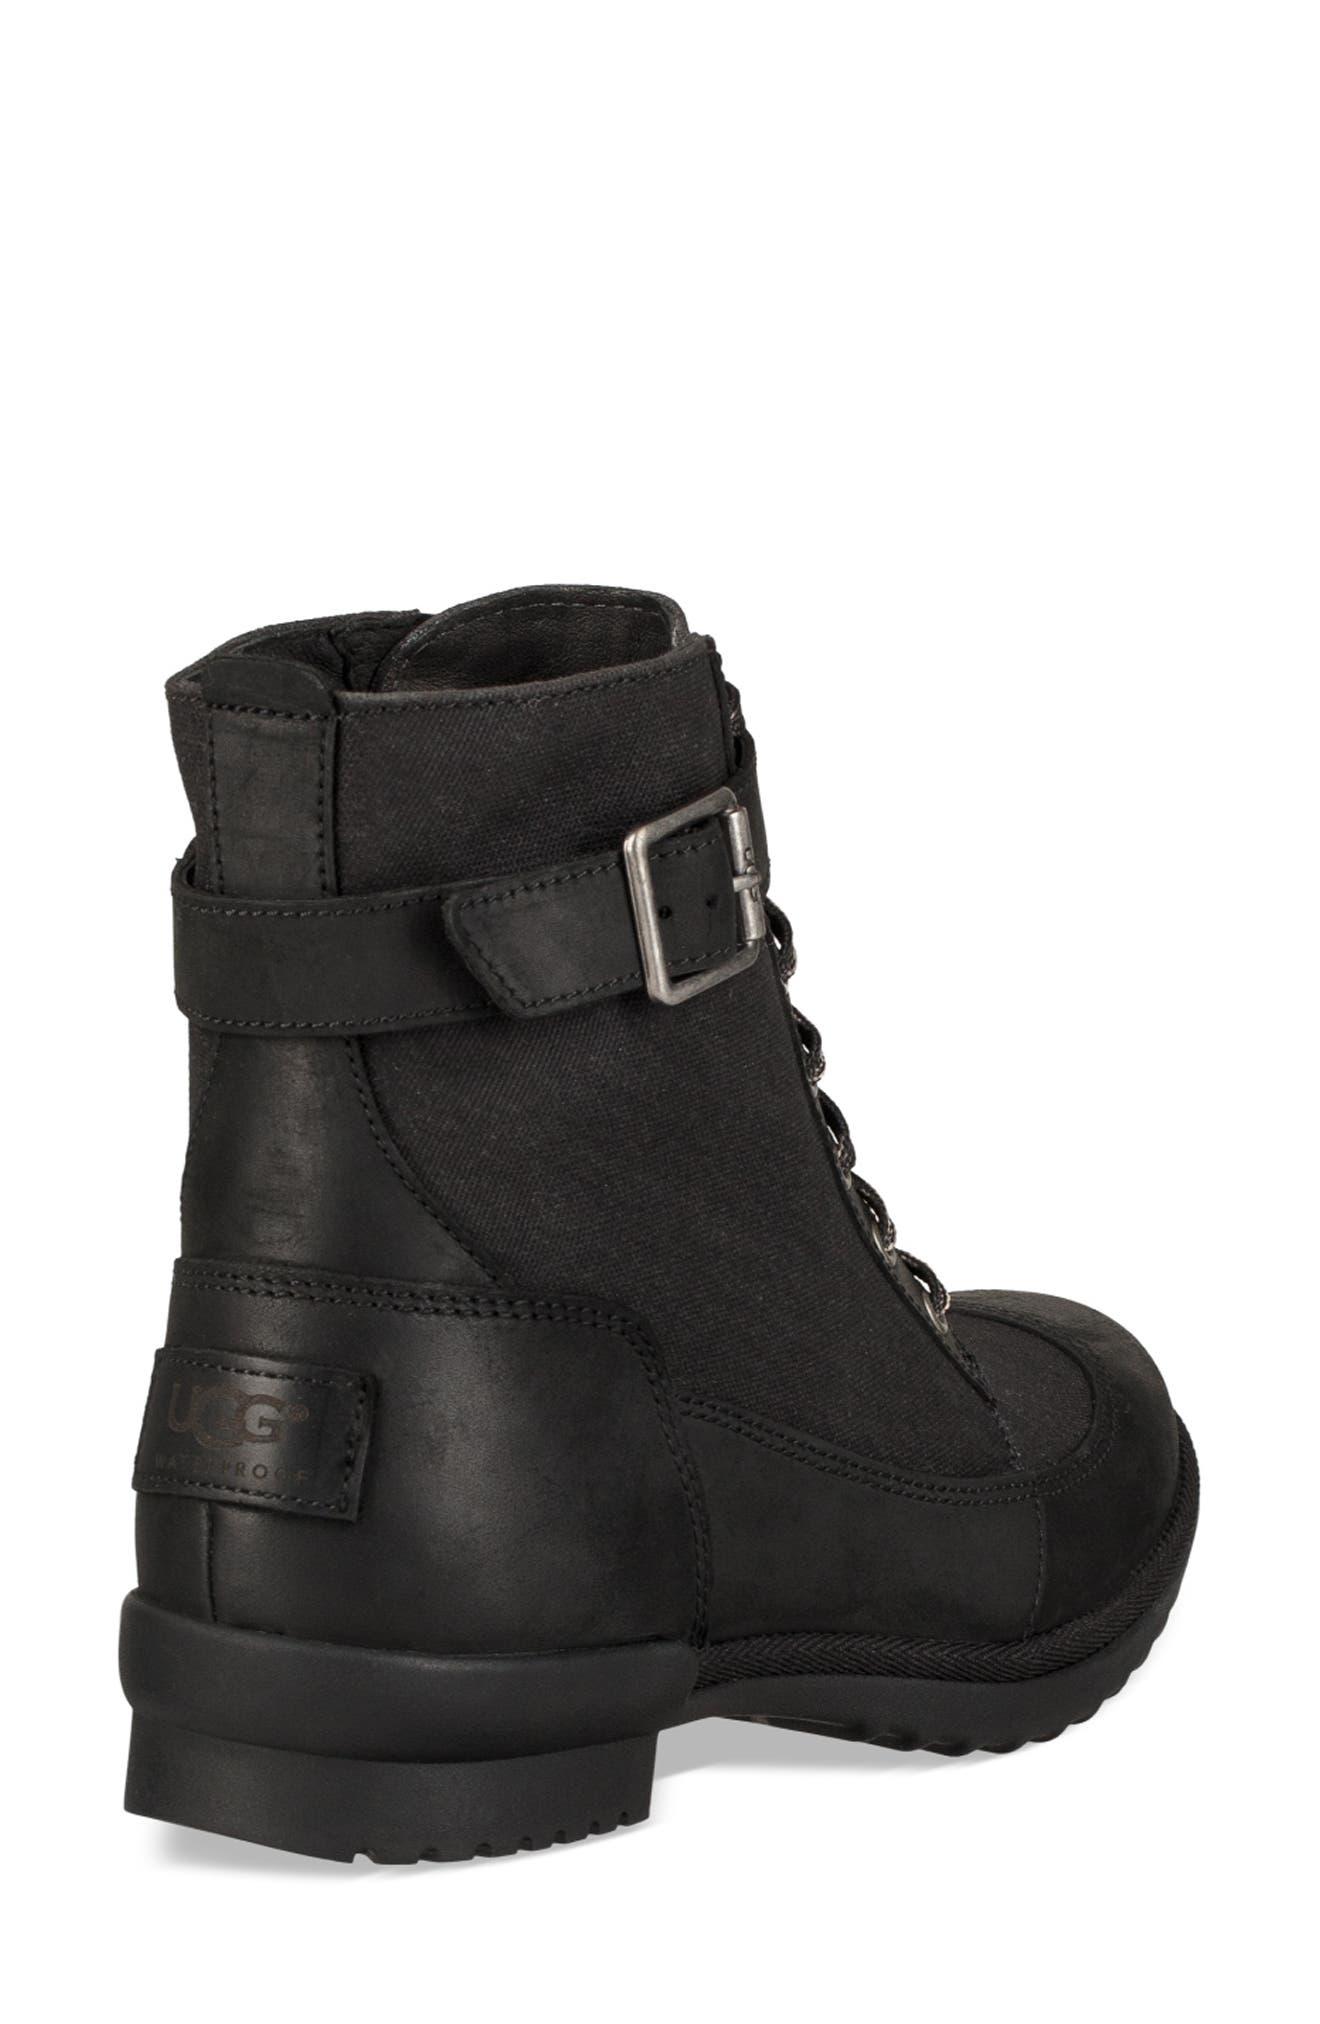 Tulane Waterproof Boot,                             Alternate thumbnail 2, color,                             BLACK LEATHER